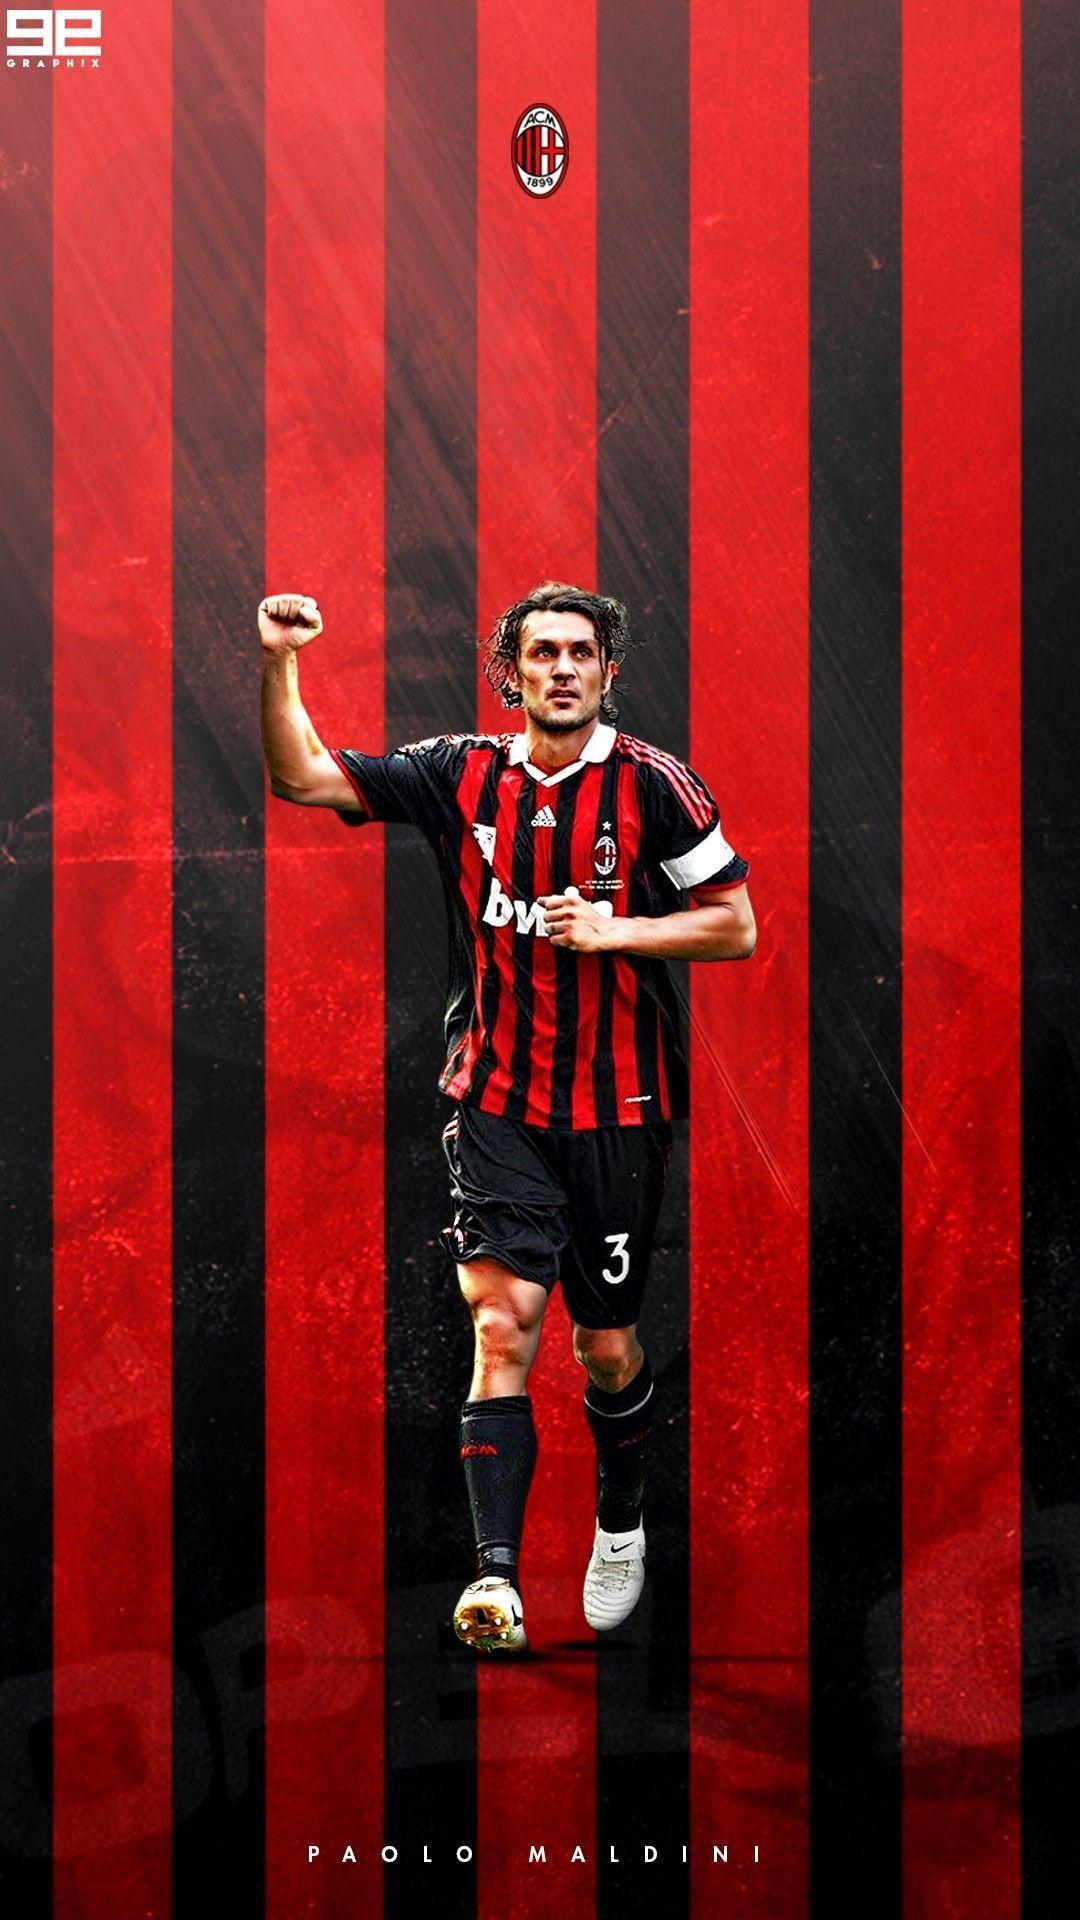 Paolo Maldini Wallpapers Top Free Paolo Maldini Backgrounds Wallpaperaccess